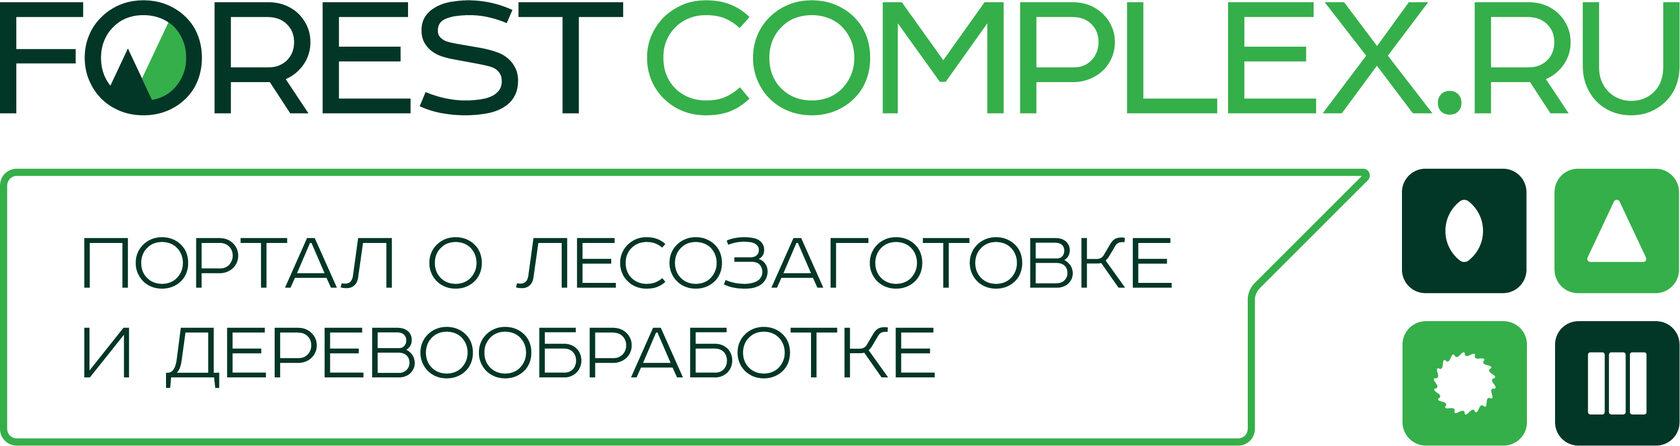 Лесной комплекс Сибири, журнал